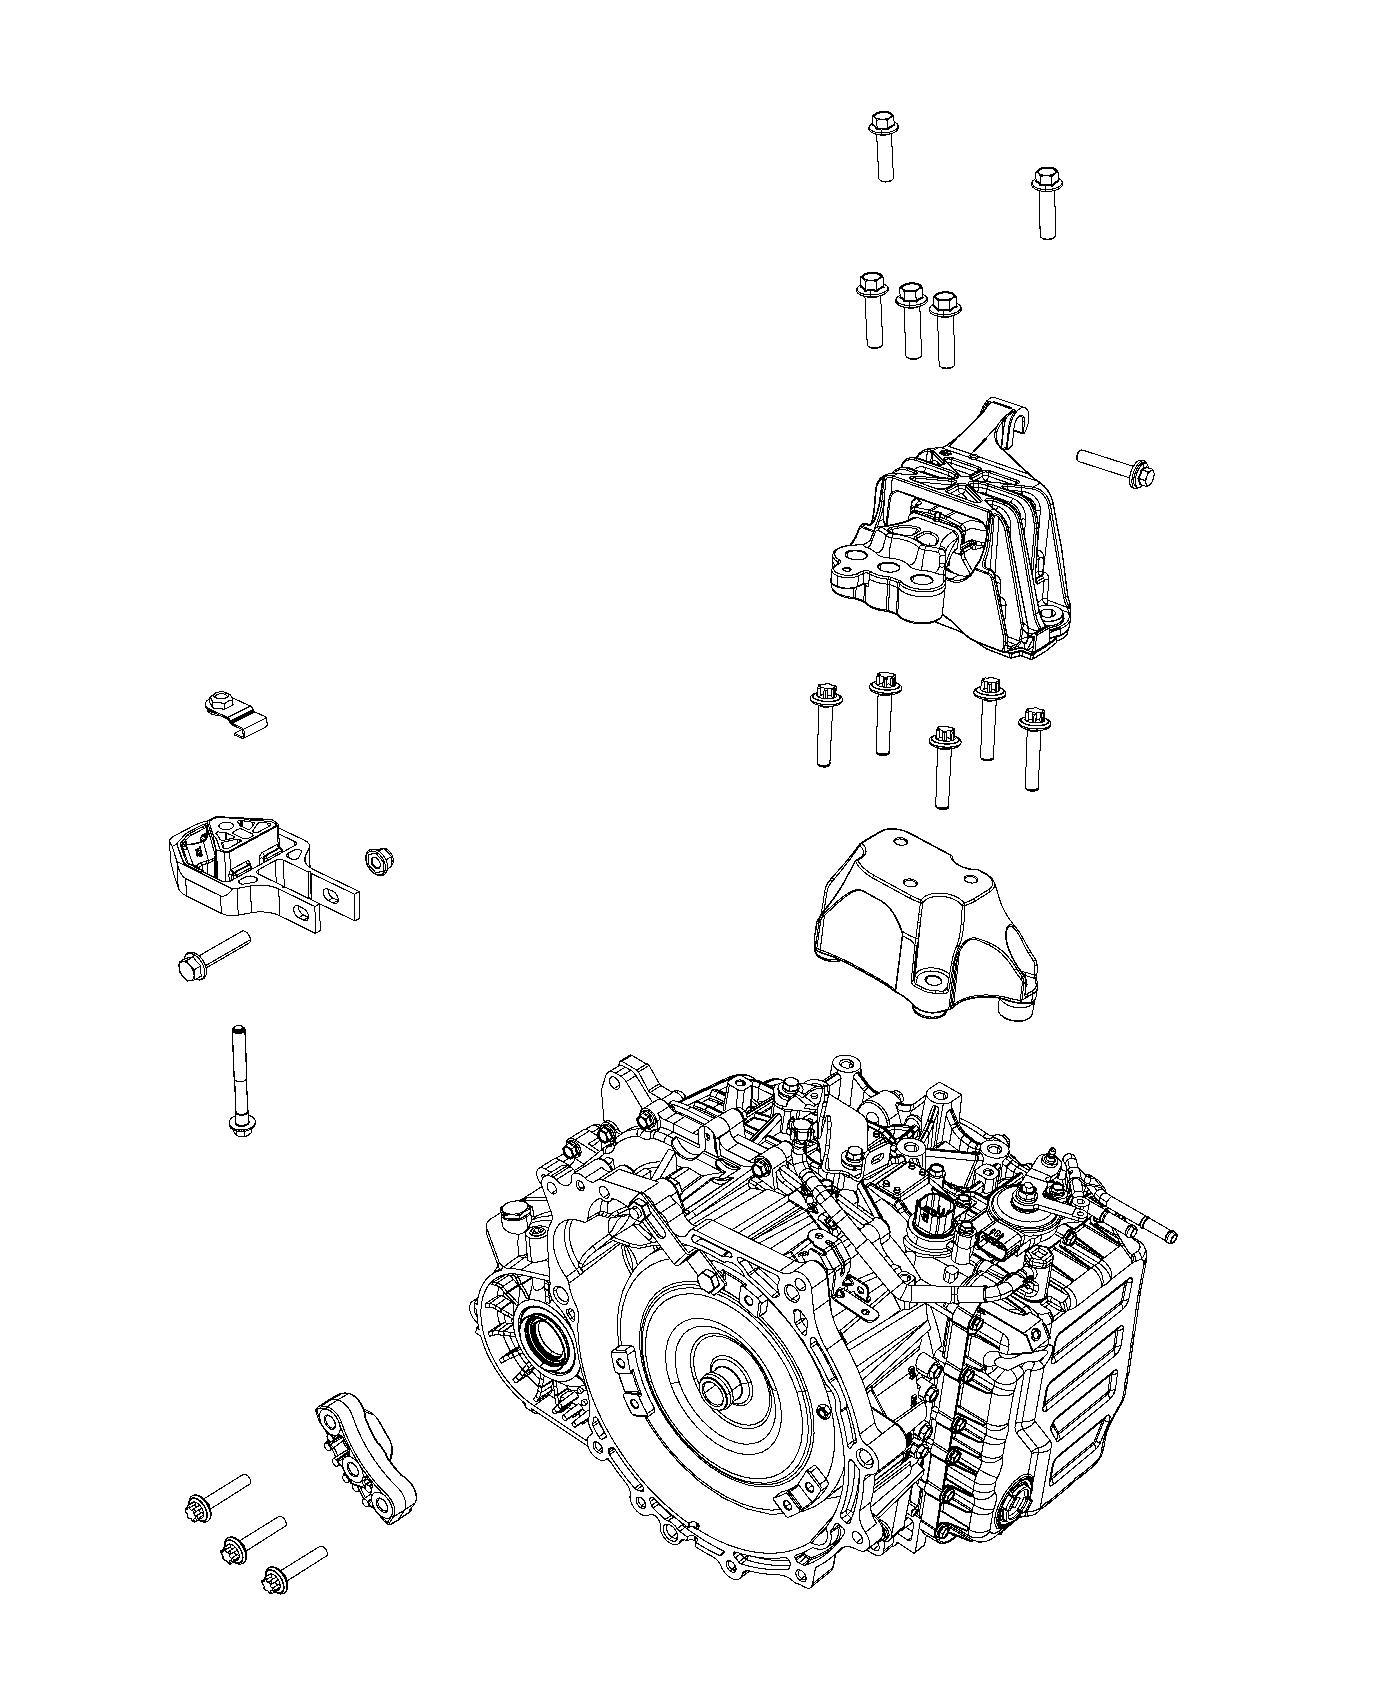 2013 Dodge Dart Insulator, isolator. Engine mount